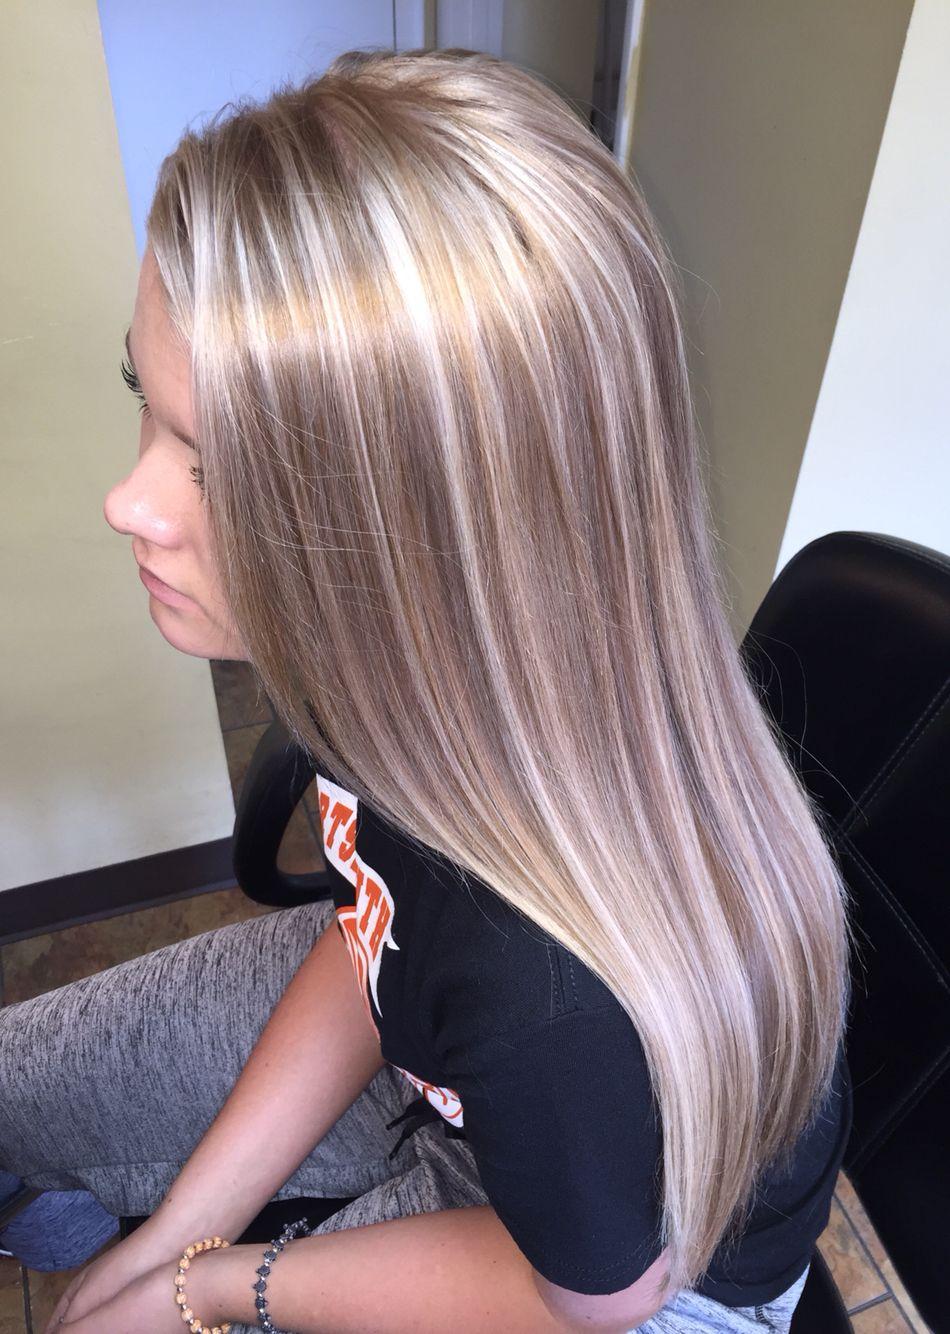 Blonde highlights ideas pinterest - Platinum Highlights Champagne Lowlights Instagram Beauty Bungalow By Stylistlindsey Aol Com Stylistlindsey On